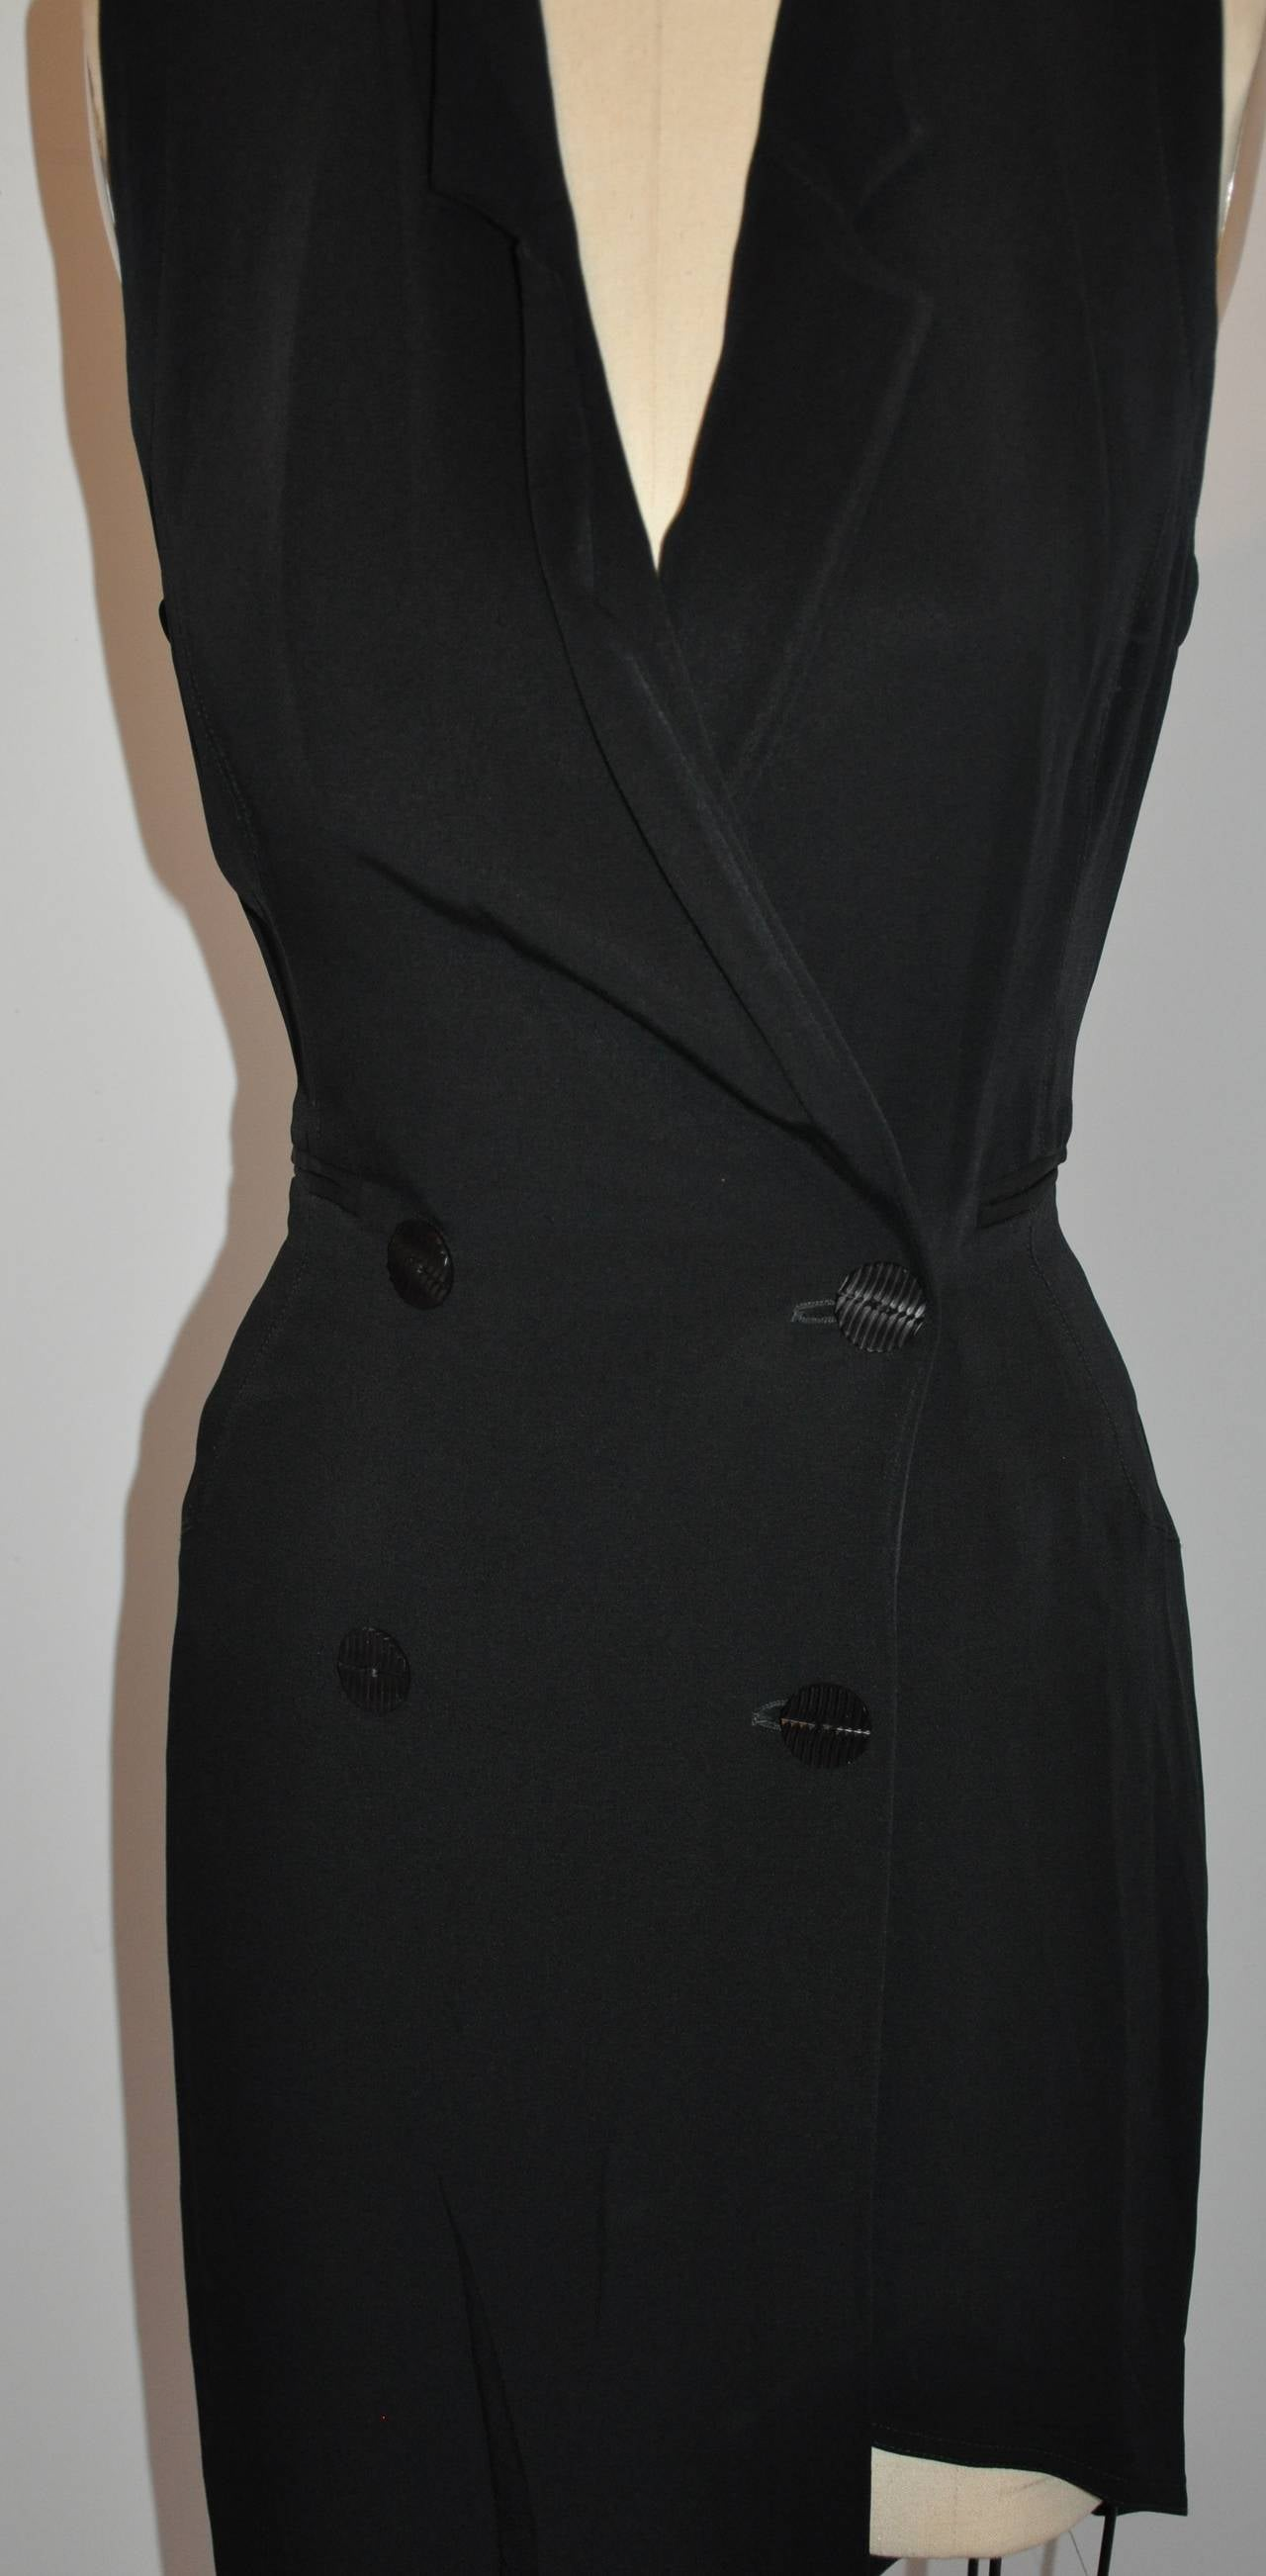 Ozbek Black Asymmetrical Double Breasted Sleeveless Dress 4